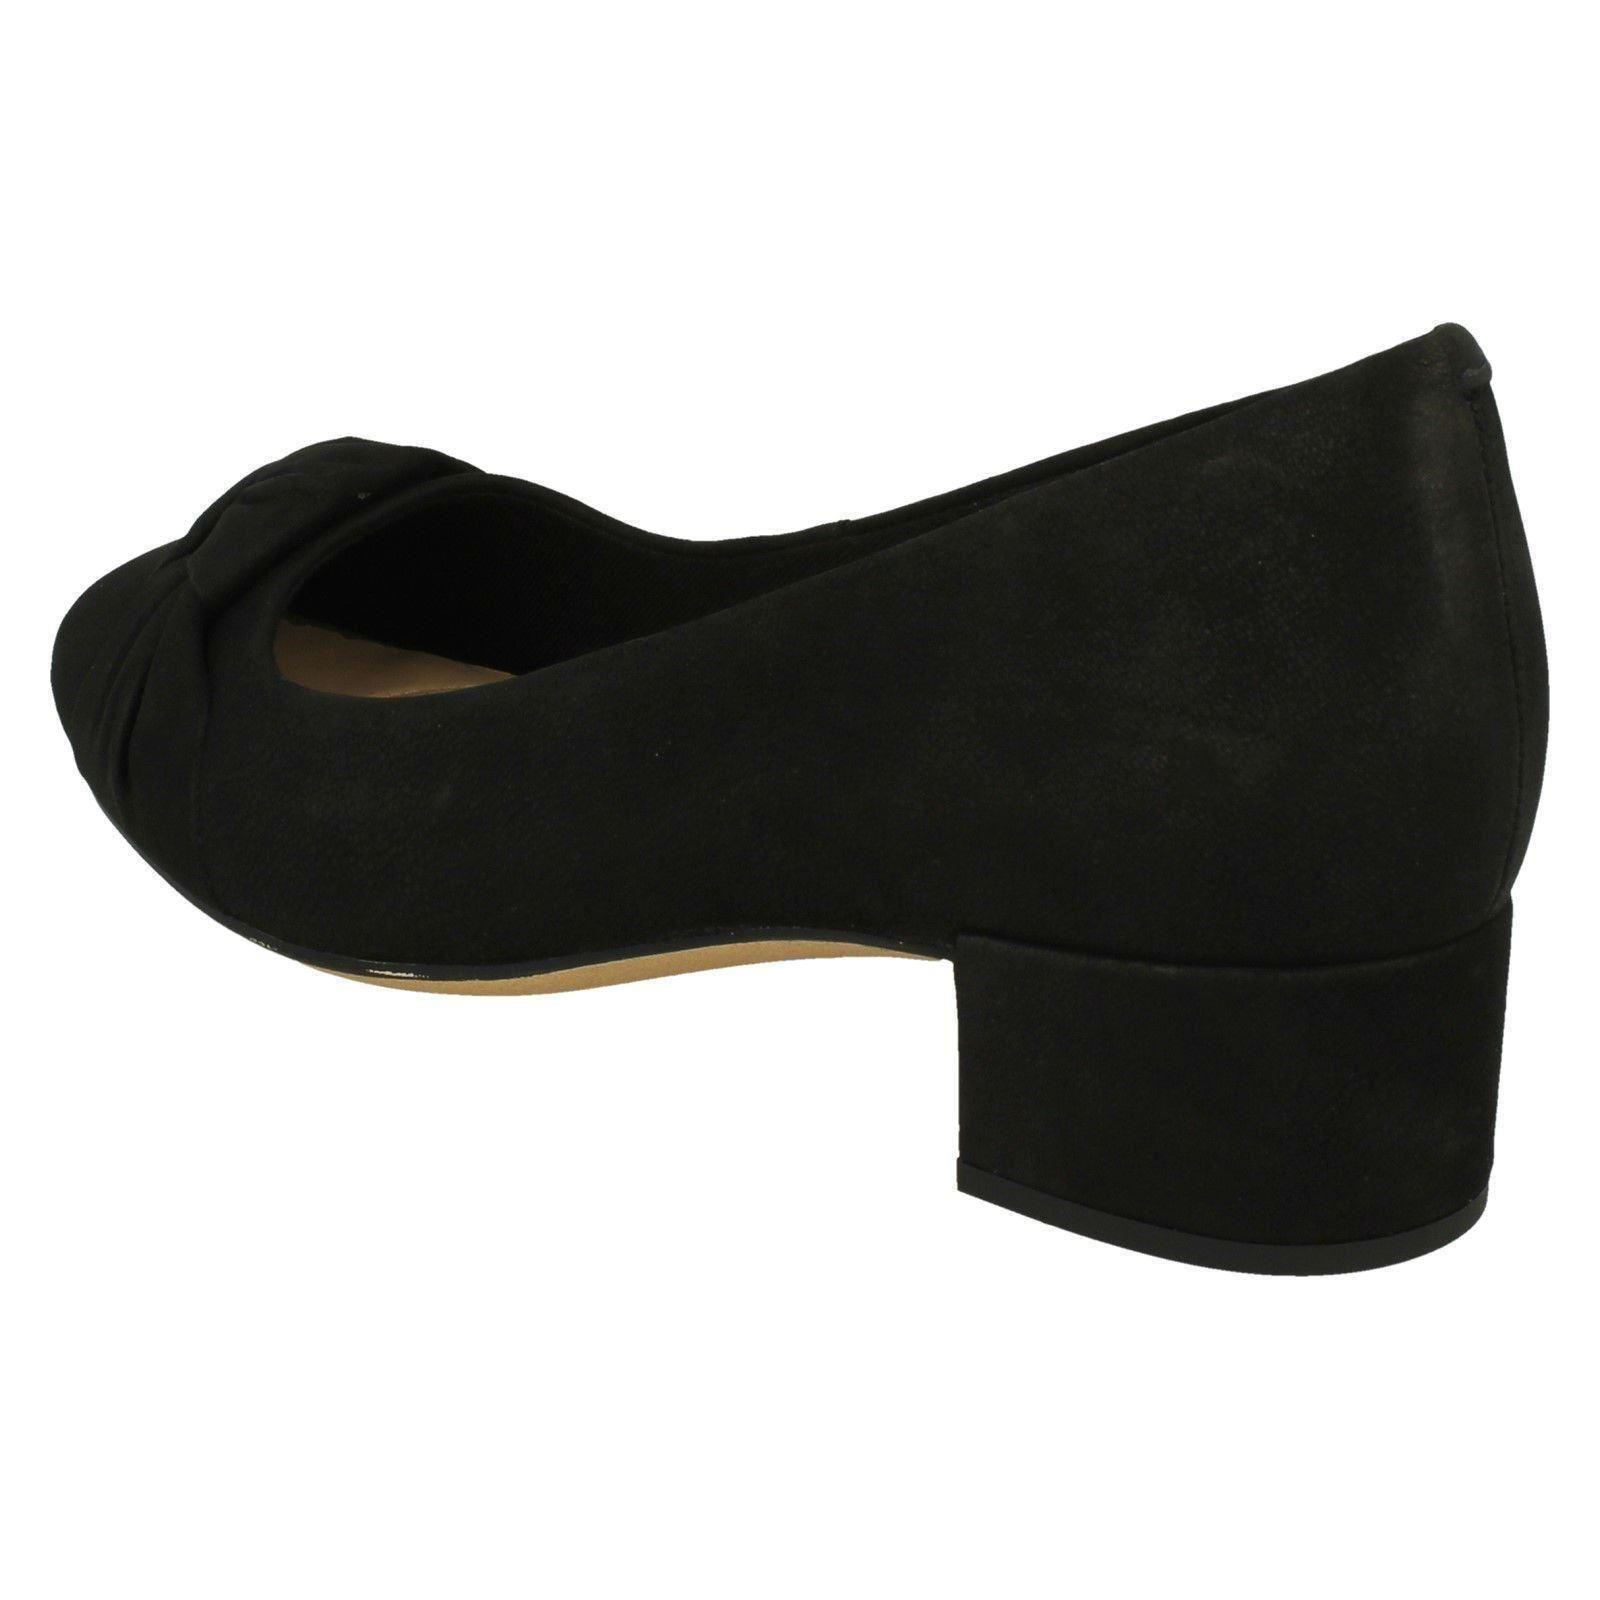 'Ladies Clarks' Bow Detailed Block Block Block Heel shoes - Orabella Lily 739069